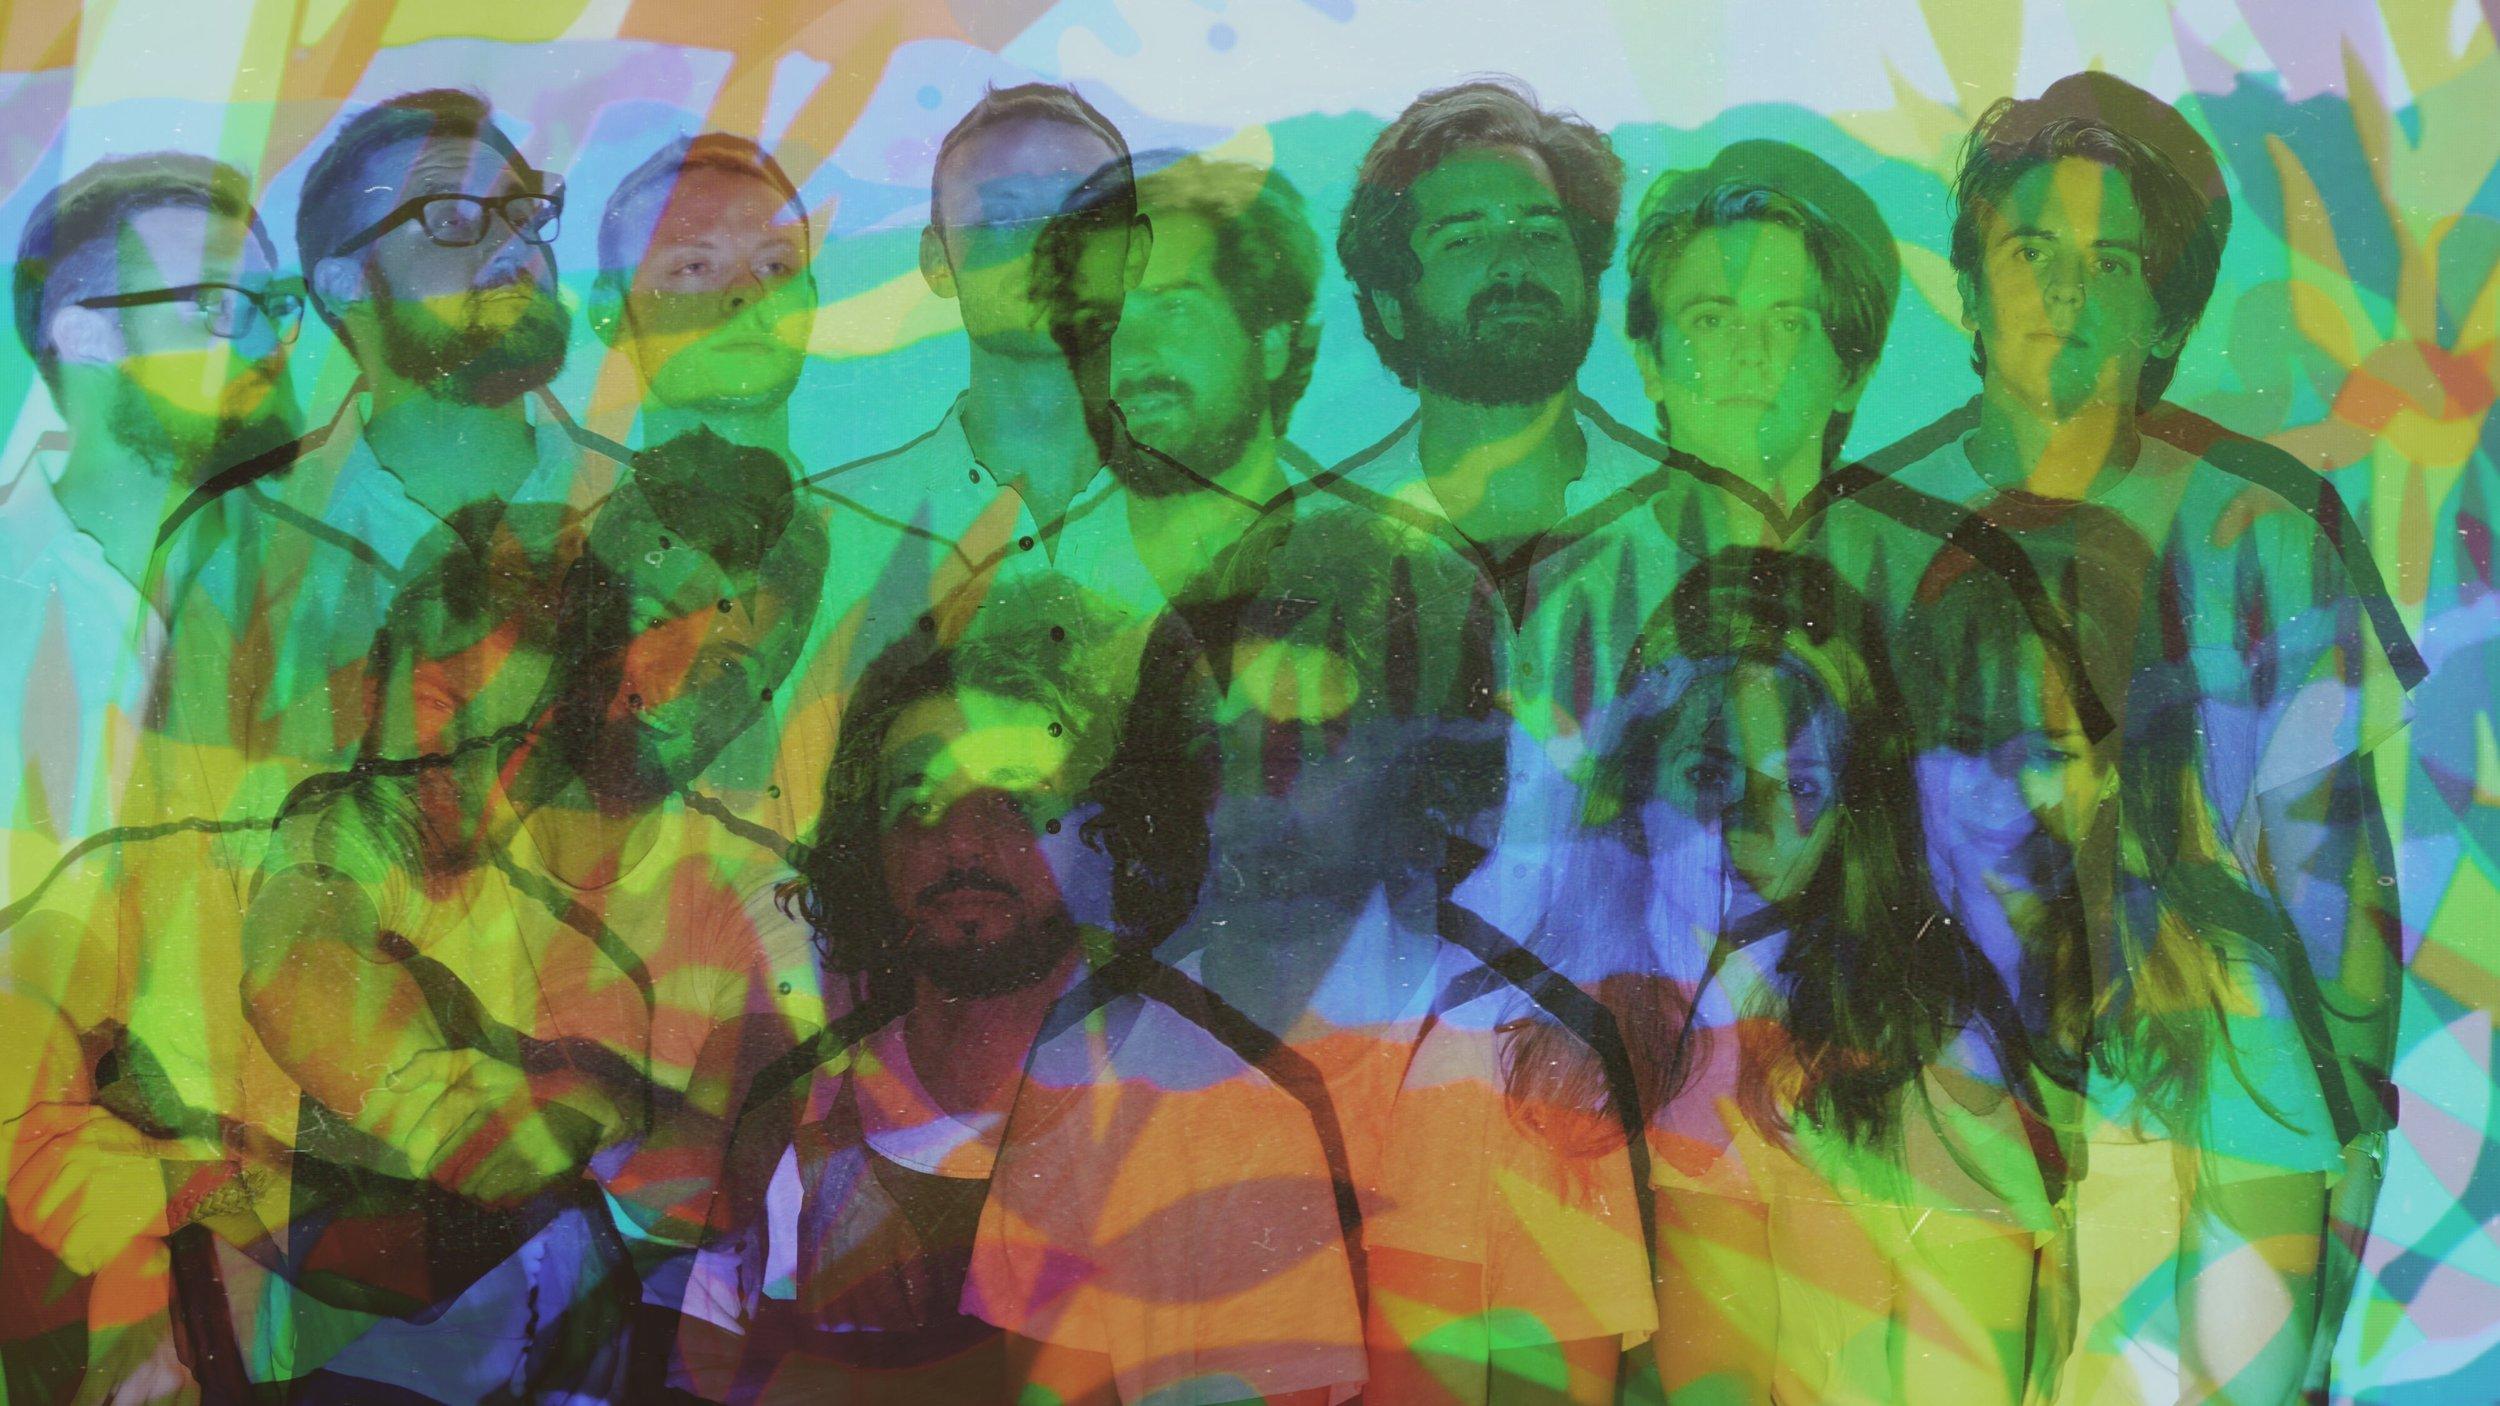 Mosaics_Color_DoubleExposure.jpg